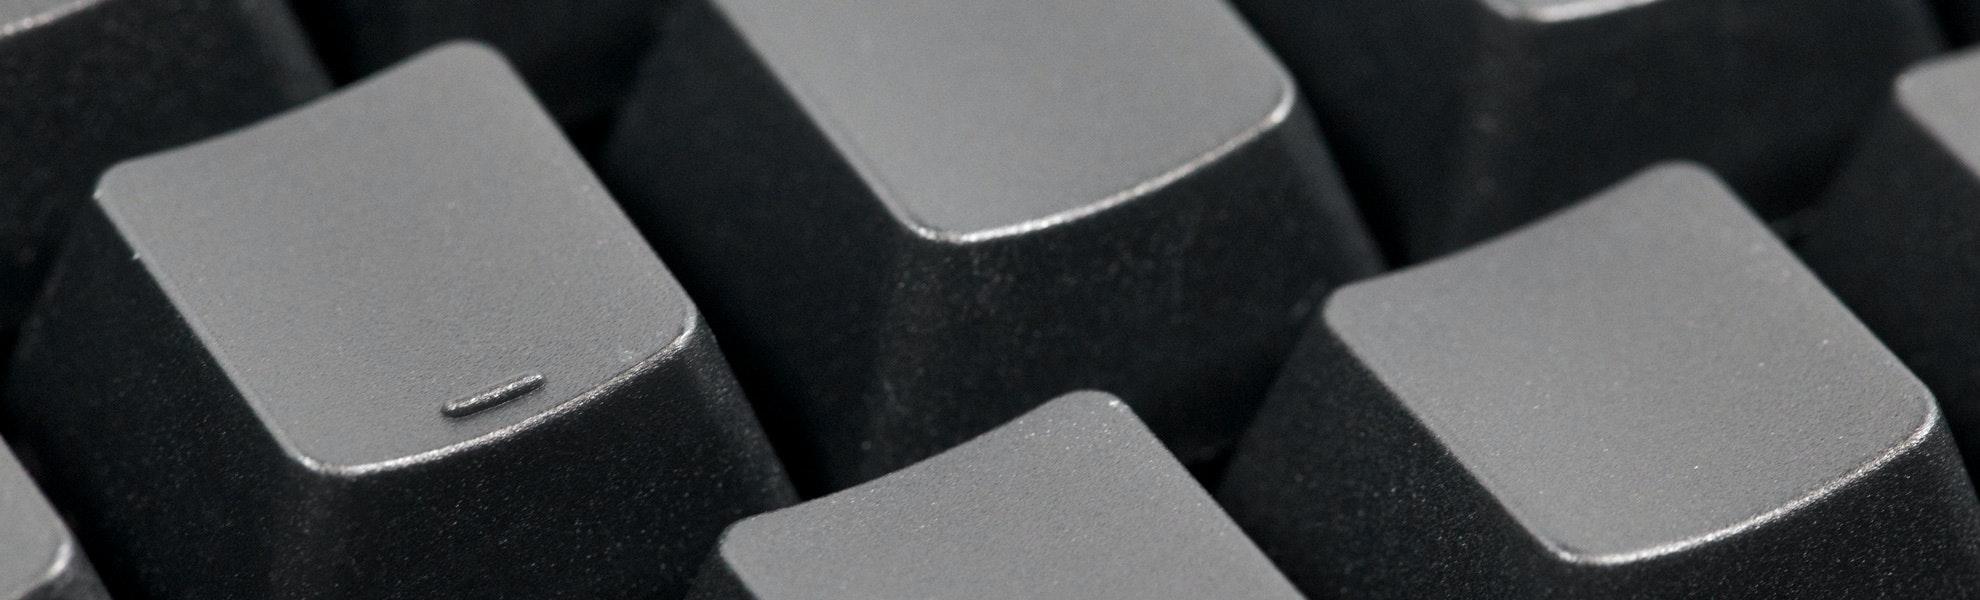 WASD ABS Full Keycap Set